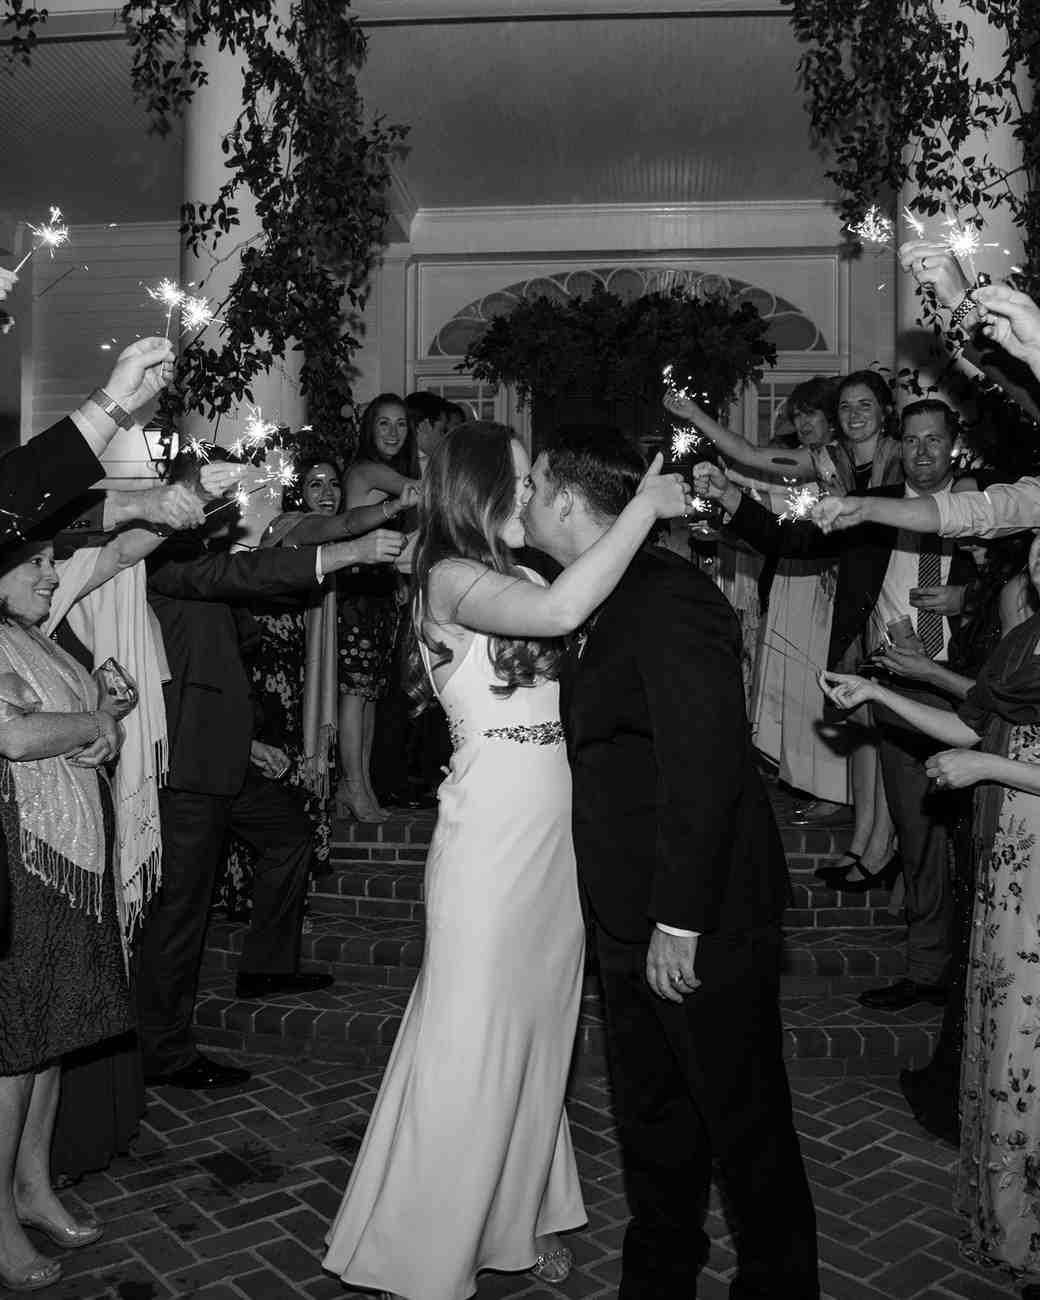 jen geoff wedding sendoff